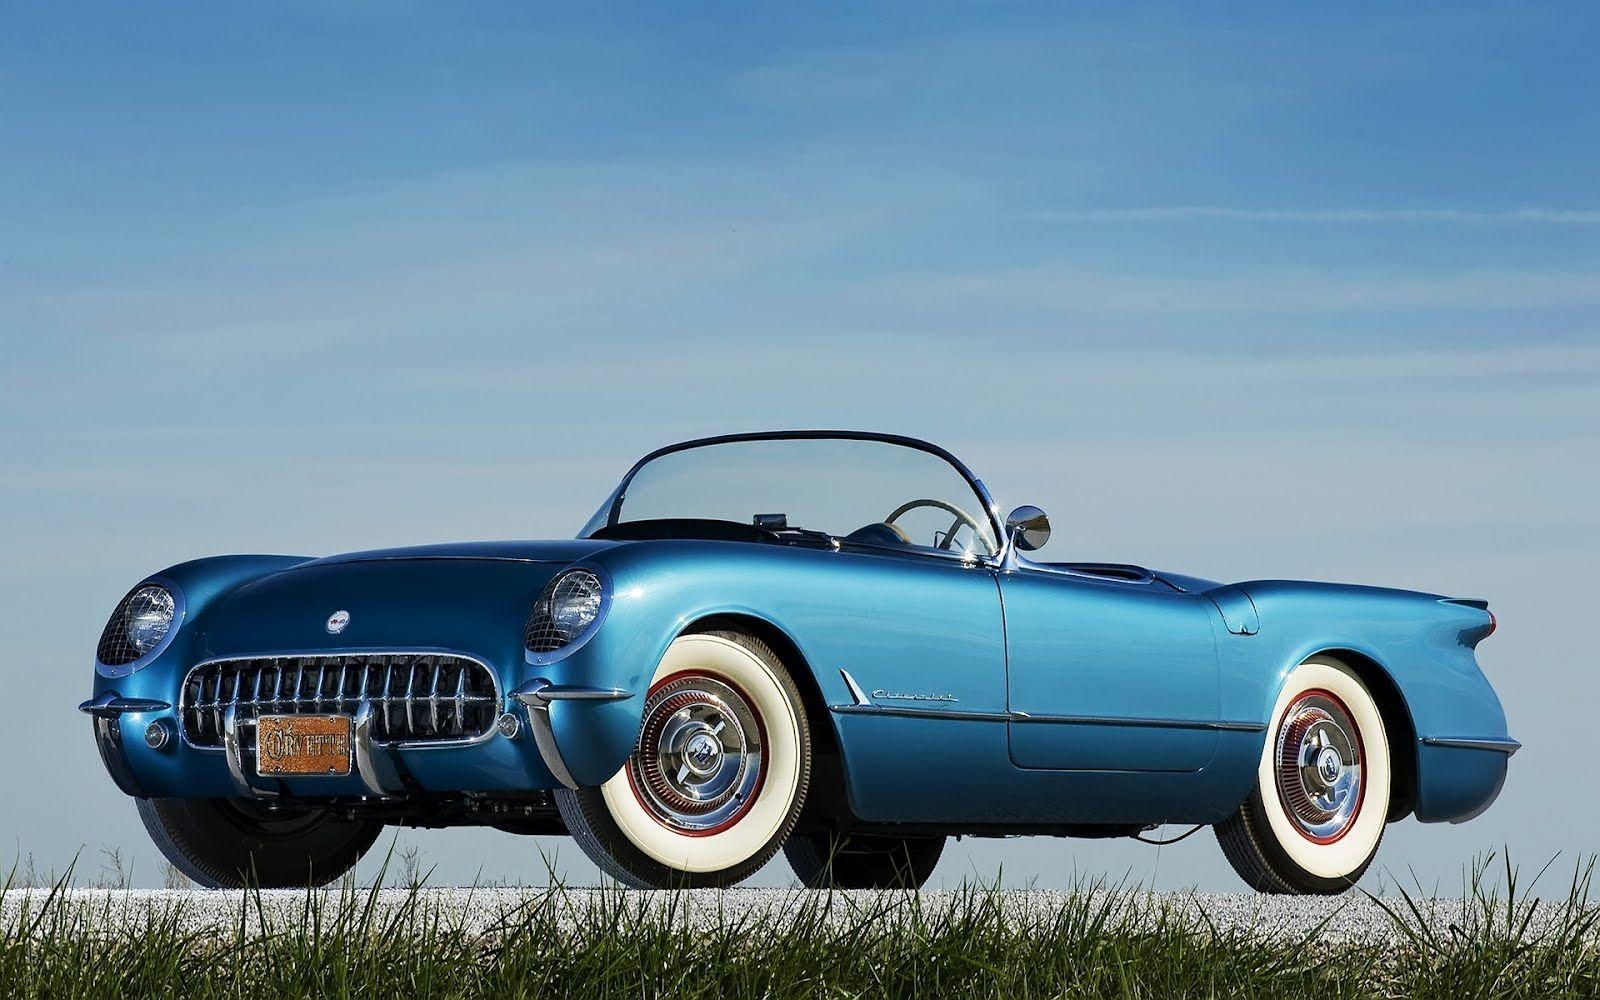 Kekurangan Corvette 1953 Perbandingan Harga